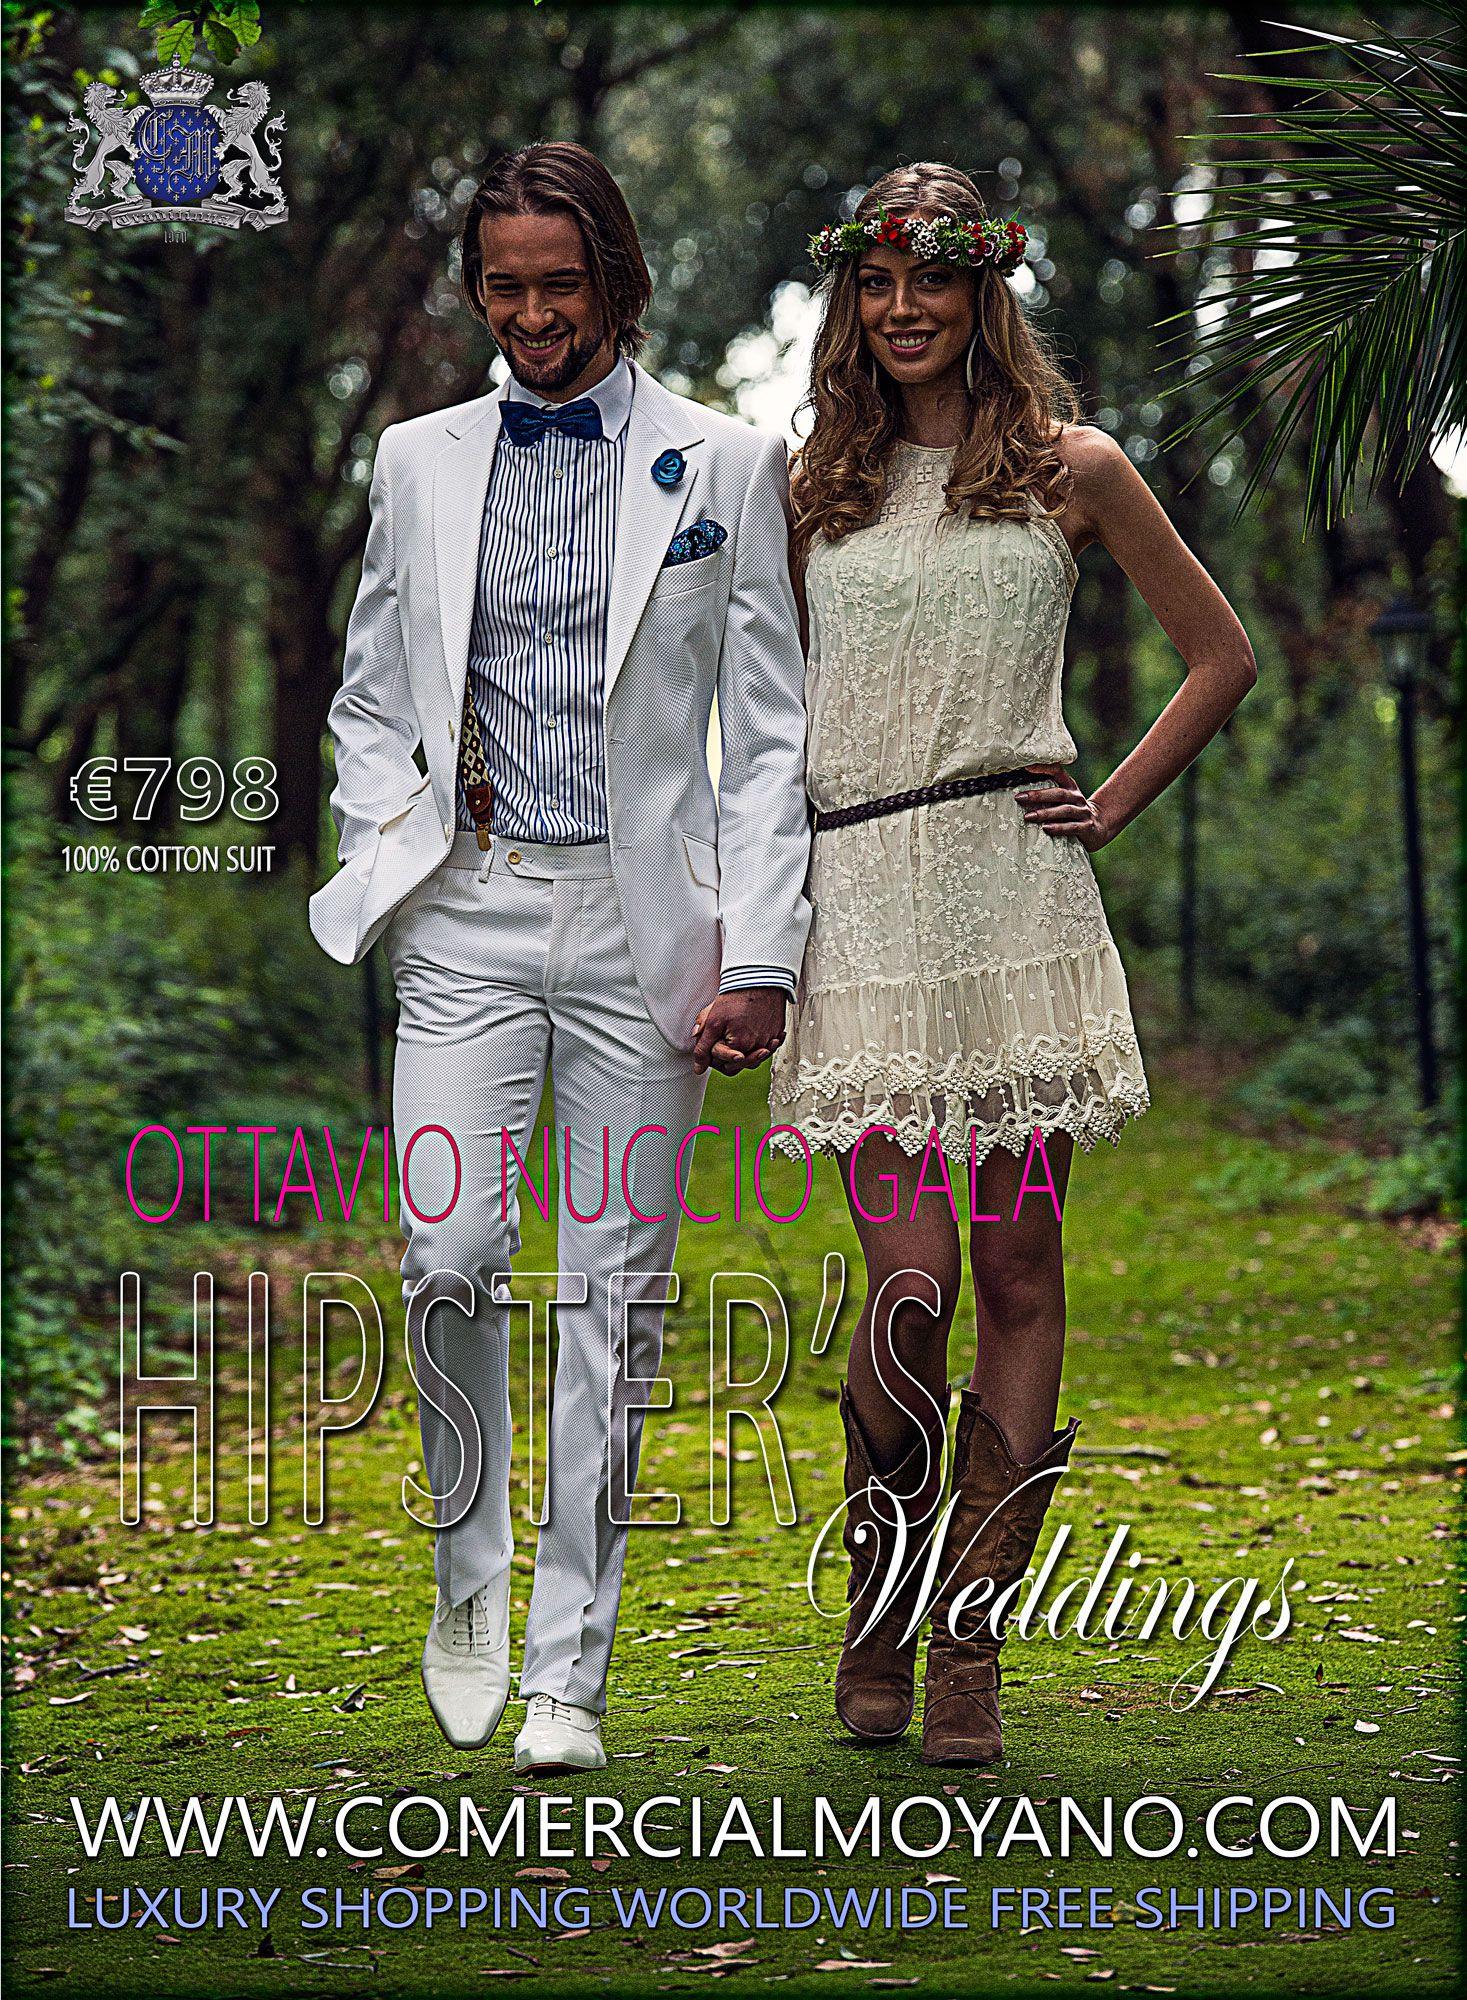 Traje de piqué blanco algodón 100% Ottavio Nuccio Gala. Compra ya! http://bit.ly/1nyuqqv